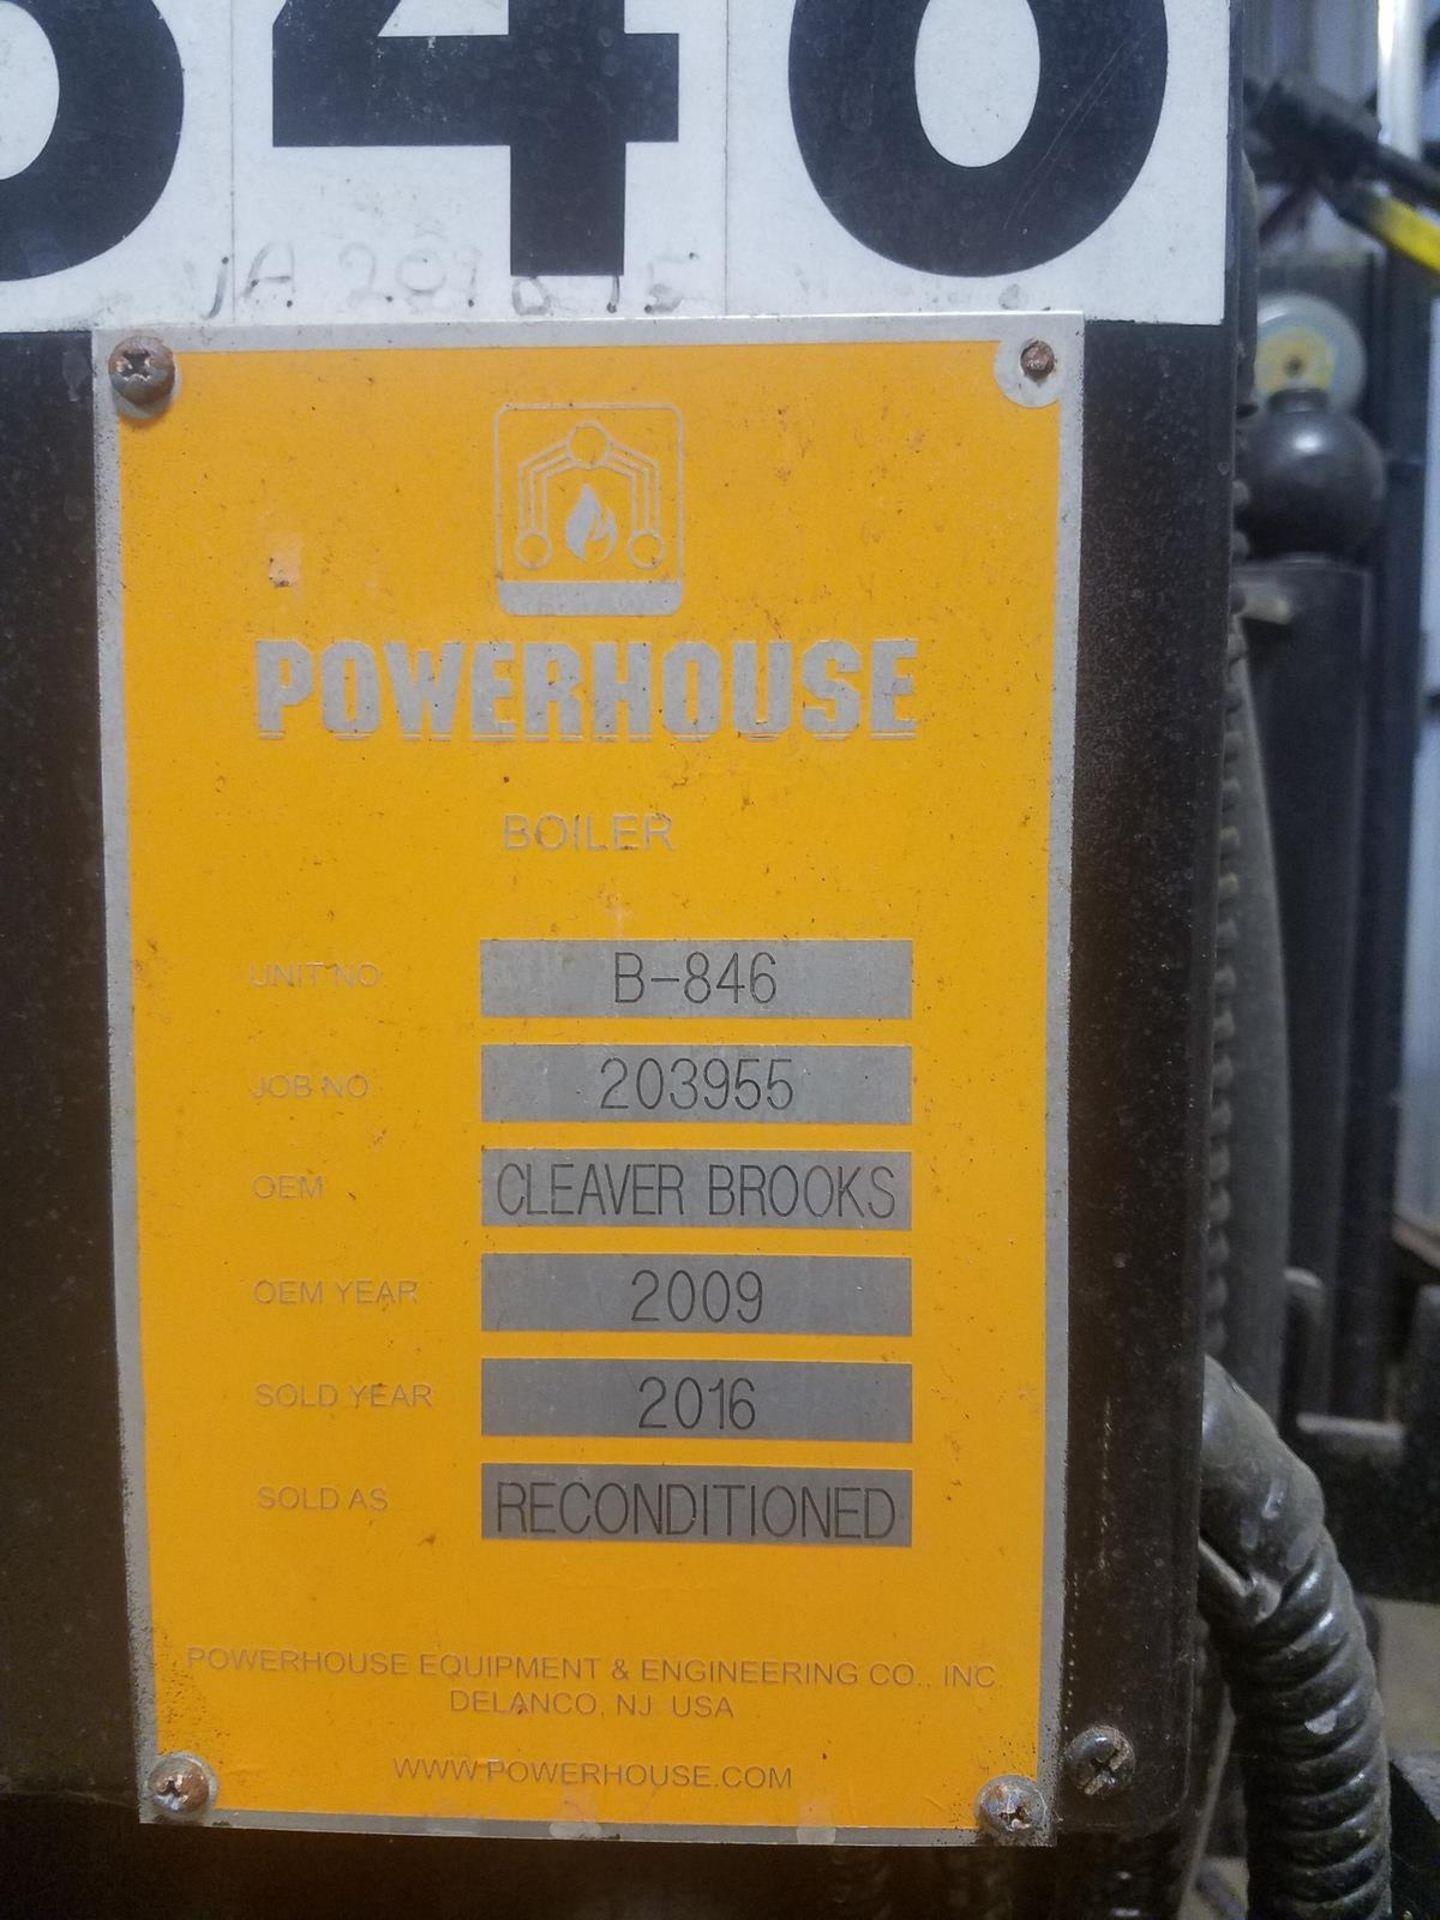 2009 (Rebuilt 2016) 250 HP Cleaver Brooks Boiler, 8.9 mmBTU, M# CB-200-250S-250, | Rig Fee: $5000 - Image 3 of 7